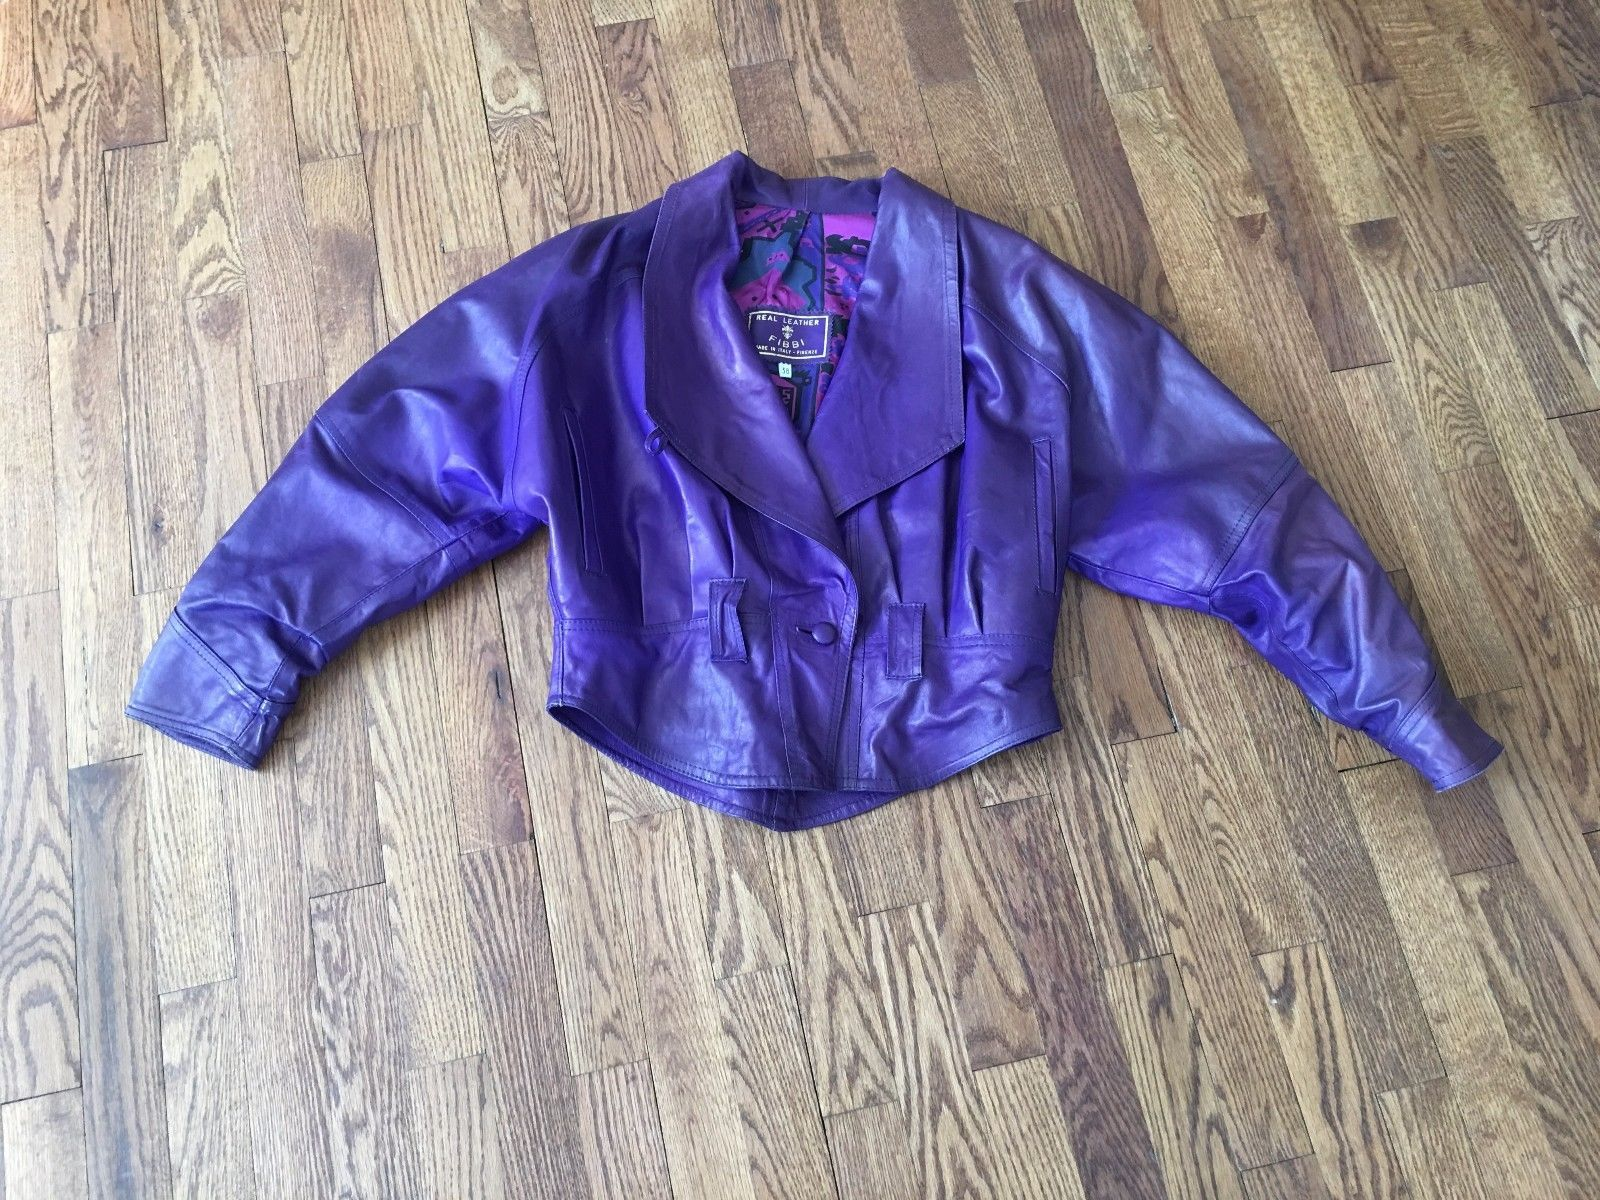 cc11a5c3e655 Fibbi Women s Purple Genuine Leather Lined and 50 similar items